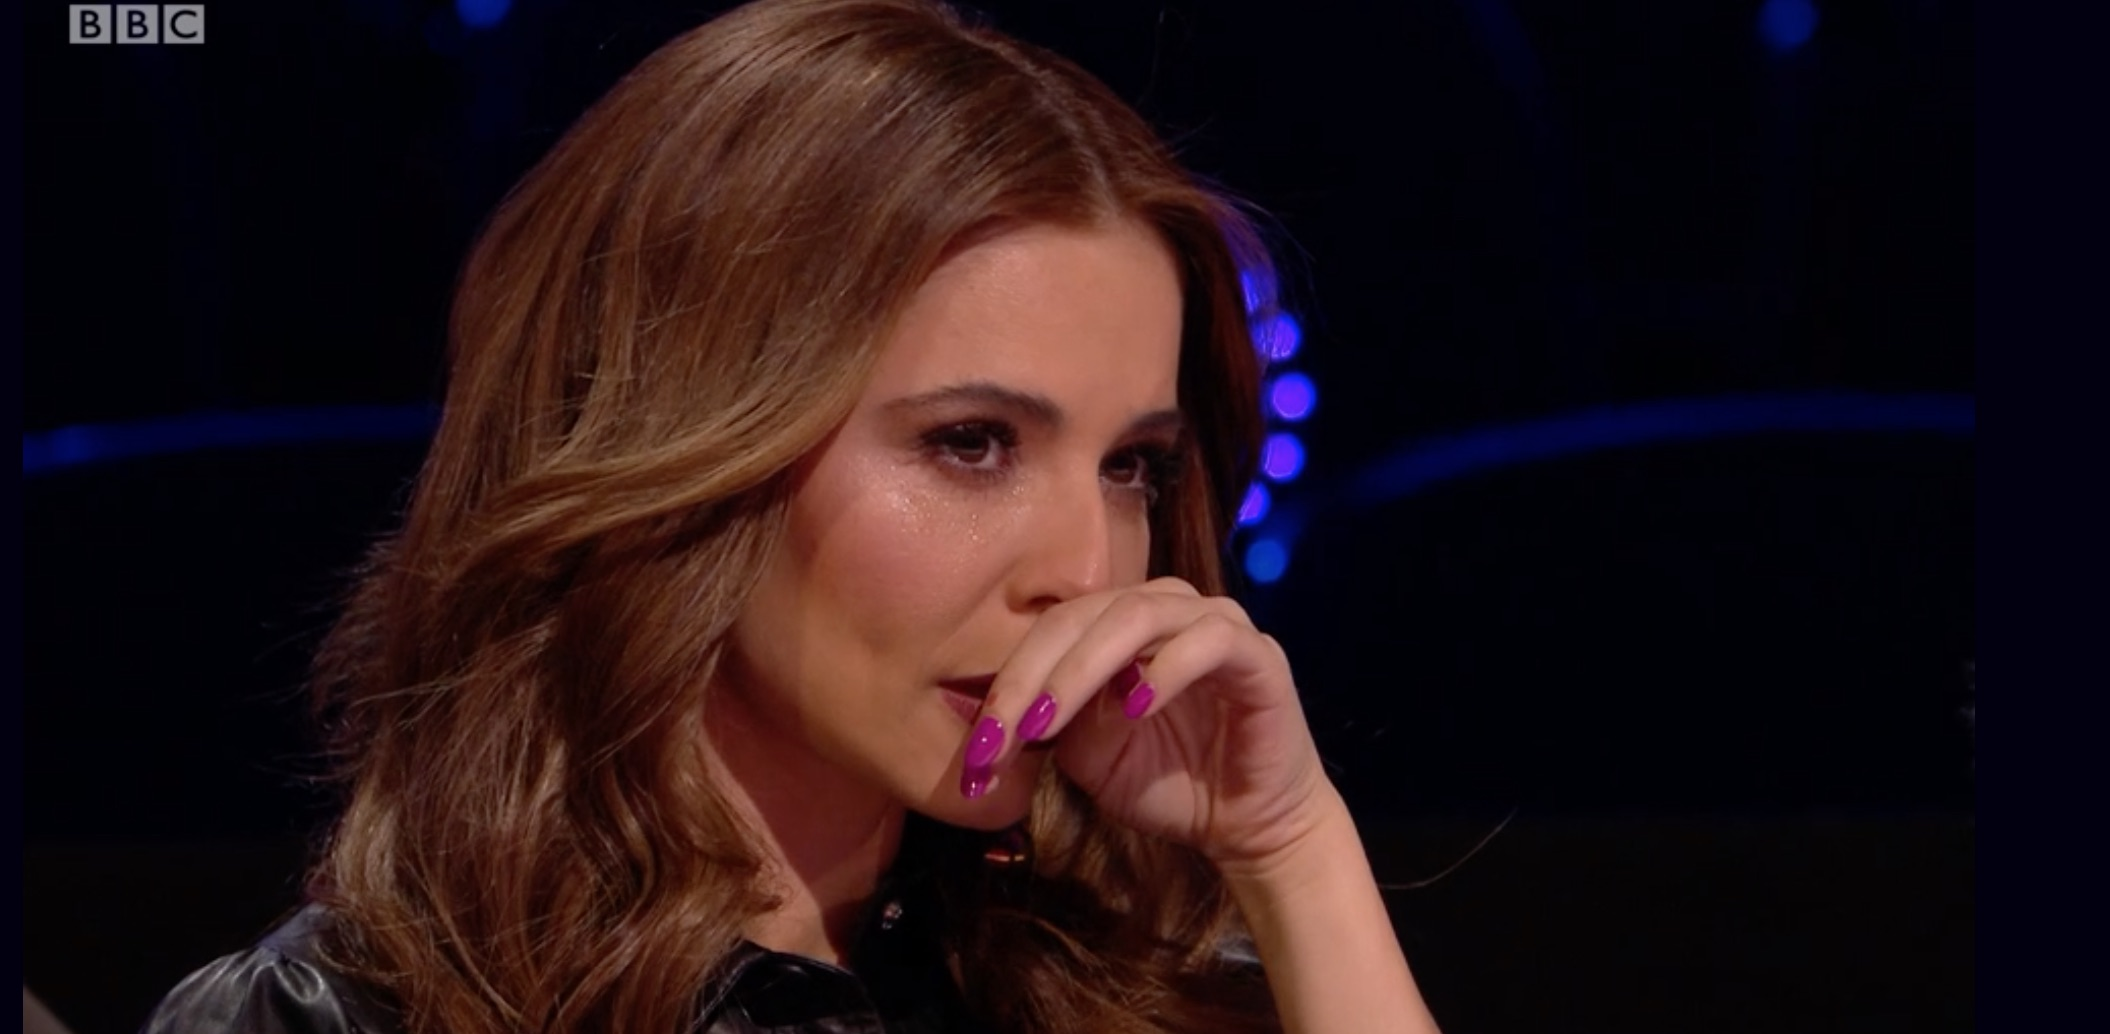 The Greatest Dancer: Cheryl in tears as wheelchair-bound dancer eliminated